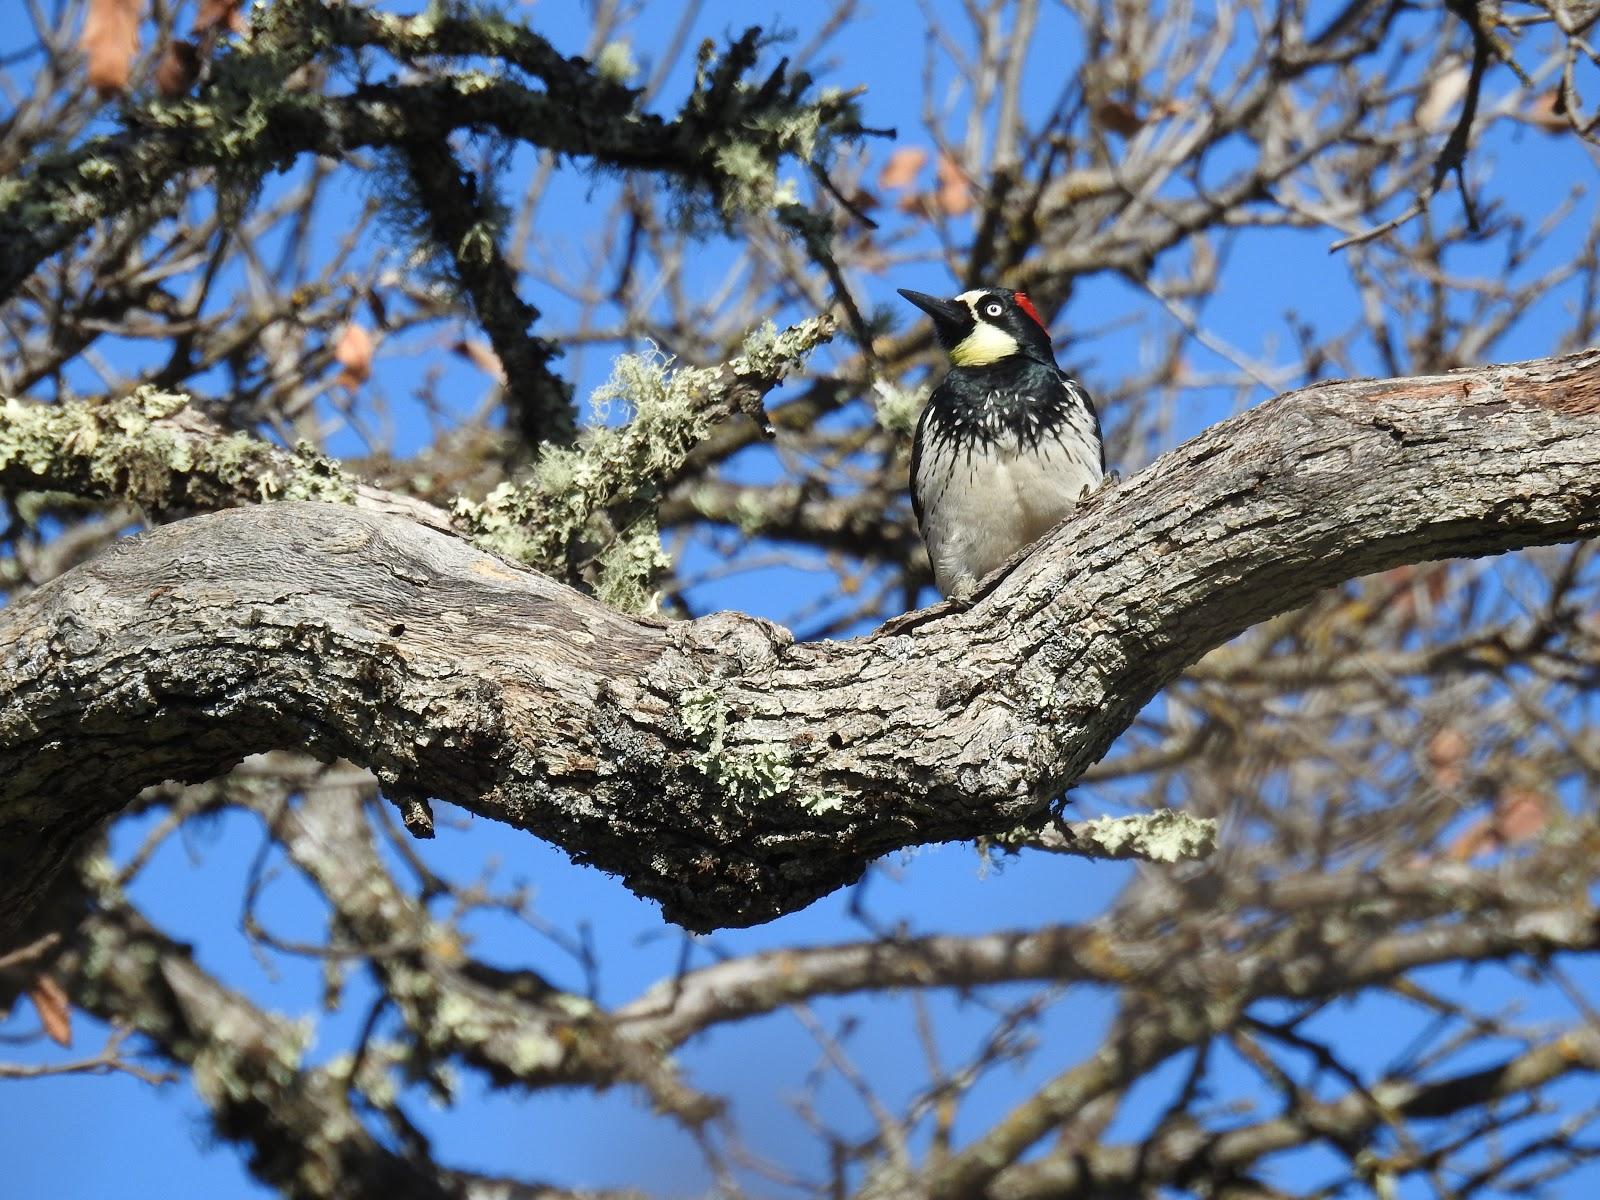 bird nature preservation